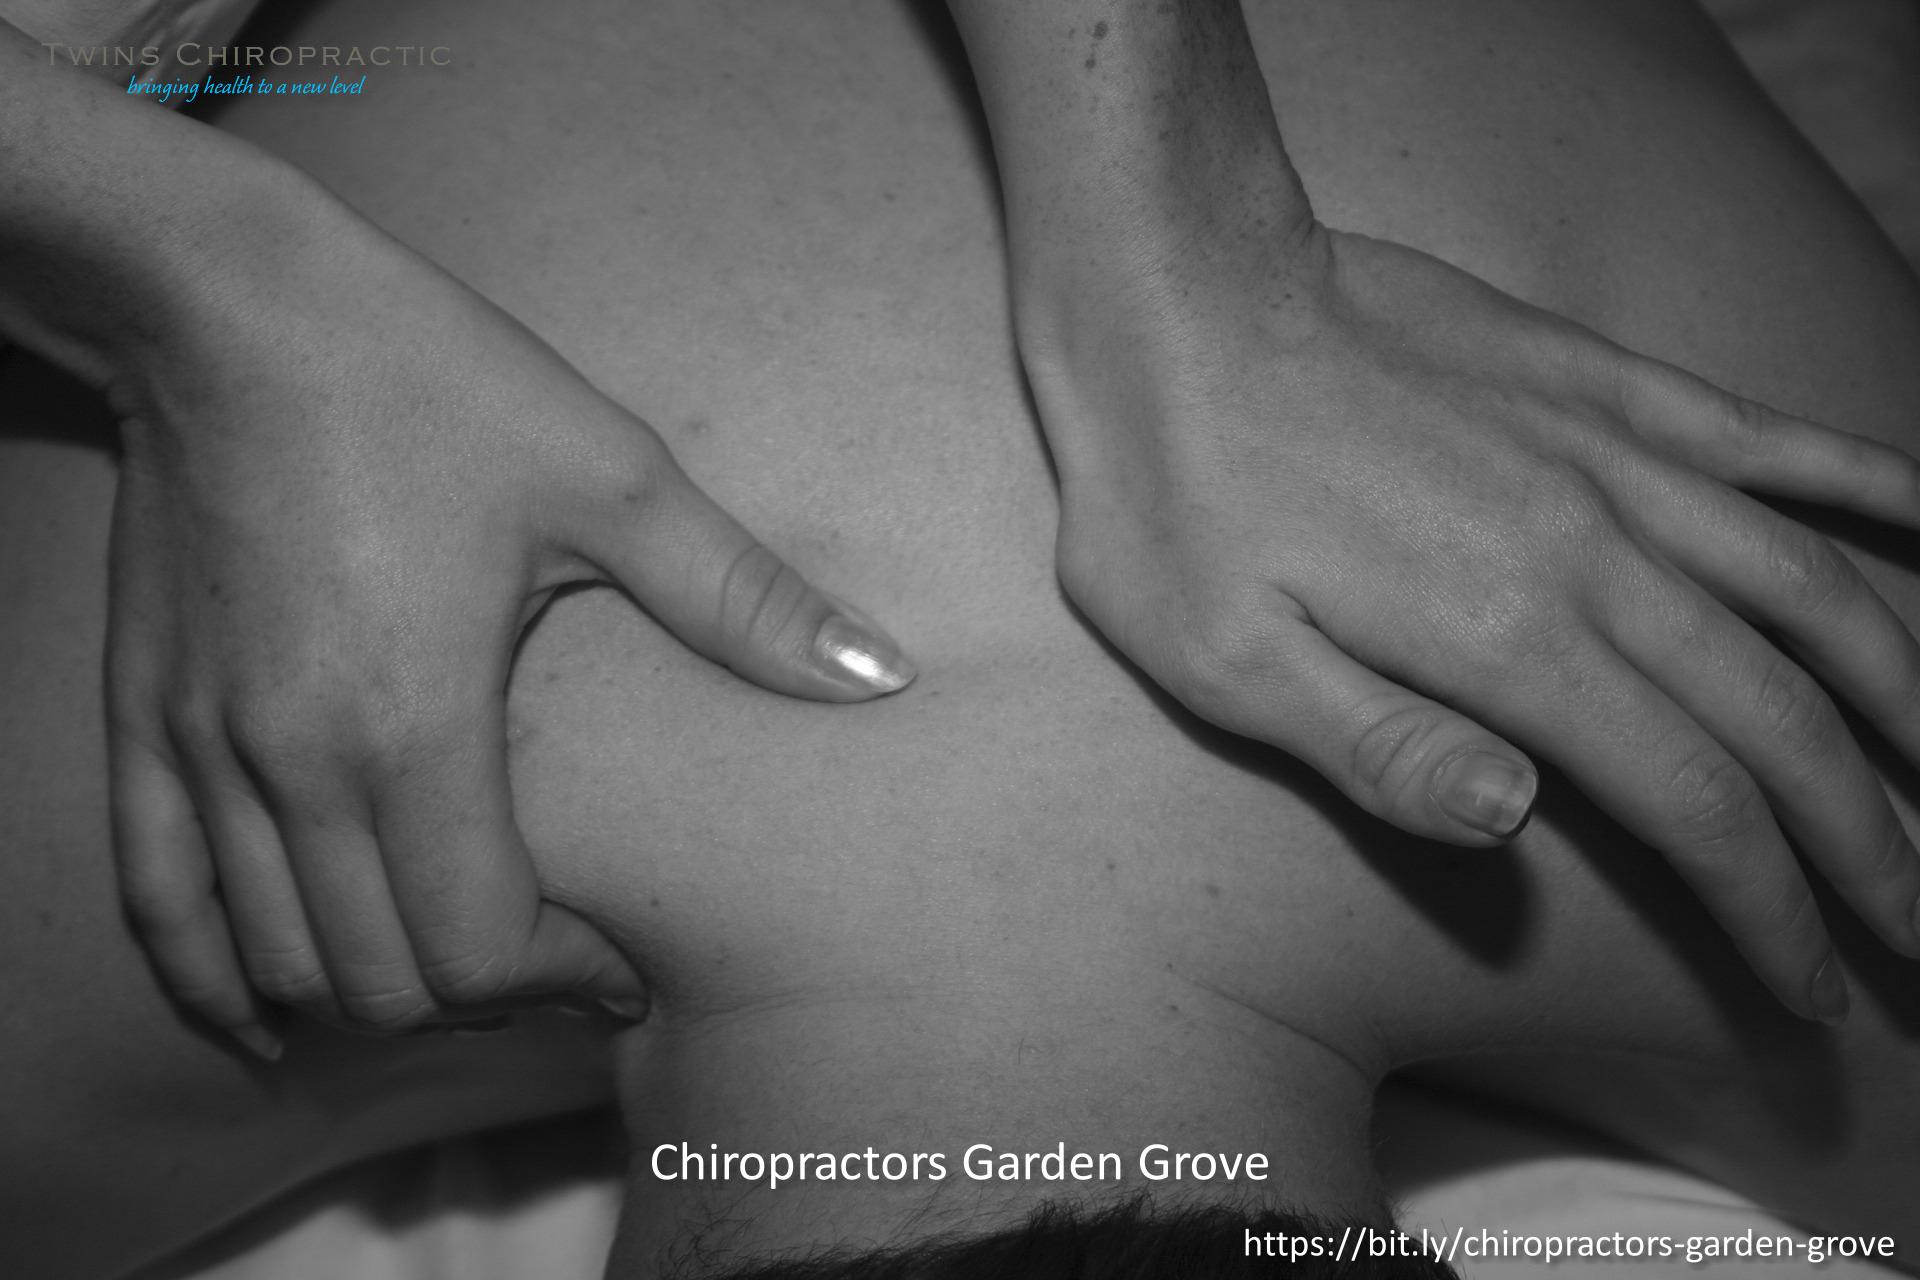 Twins Chiropractic (M3B) (CID) - 2